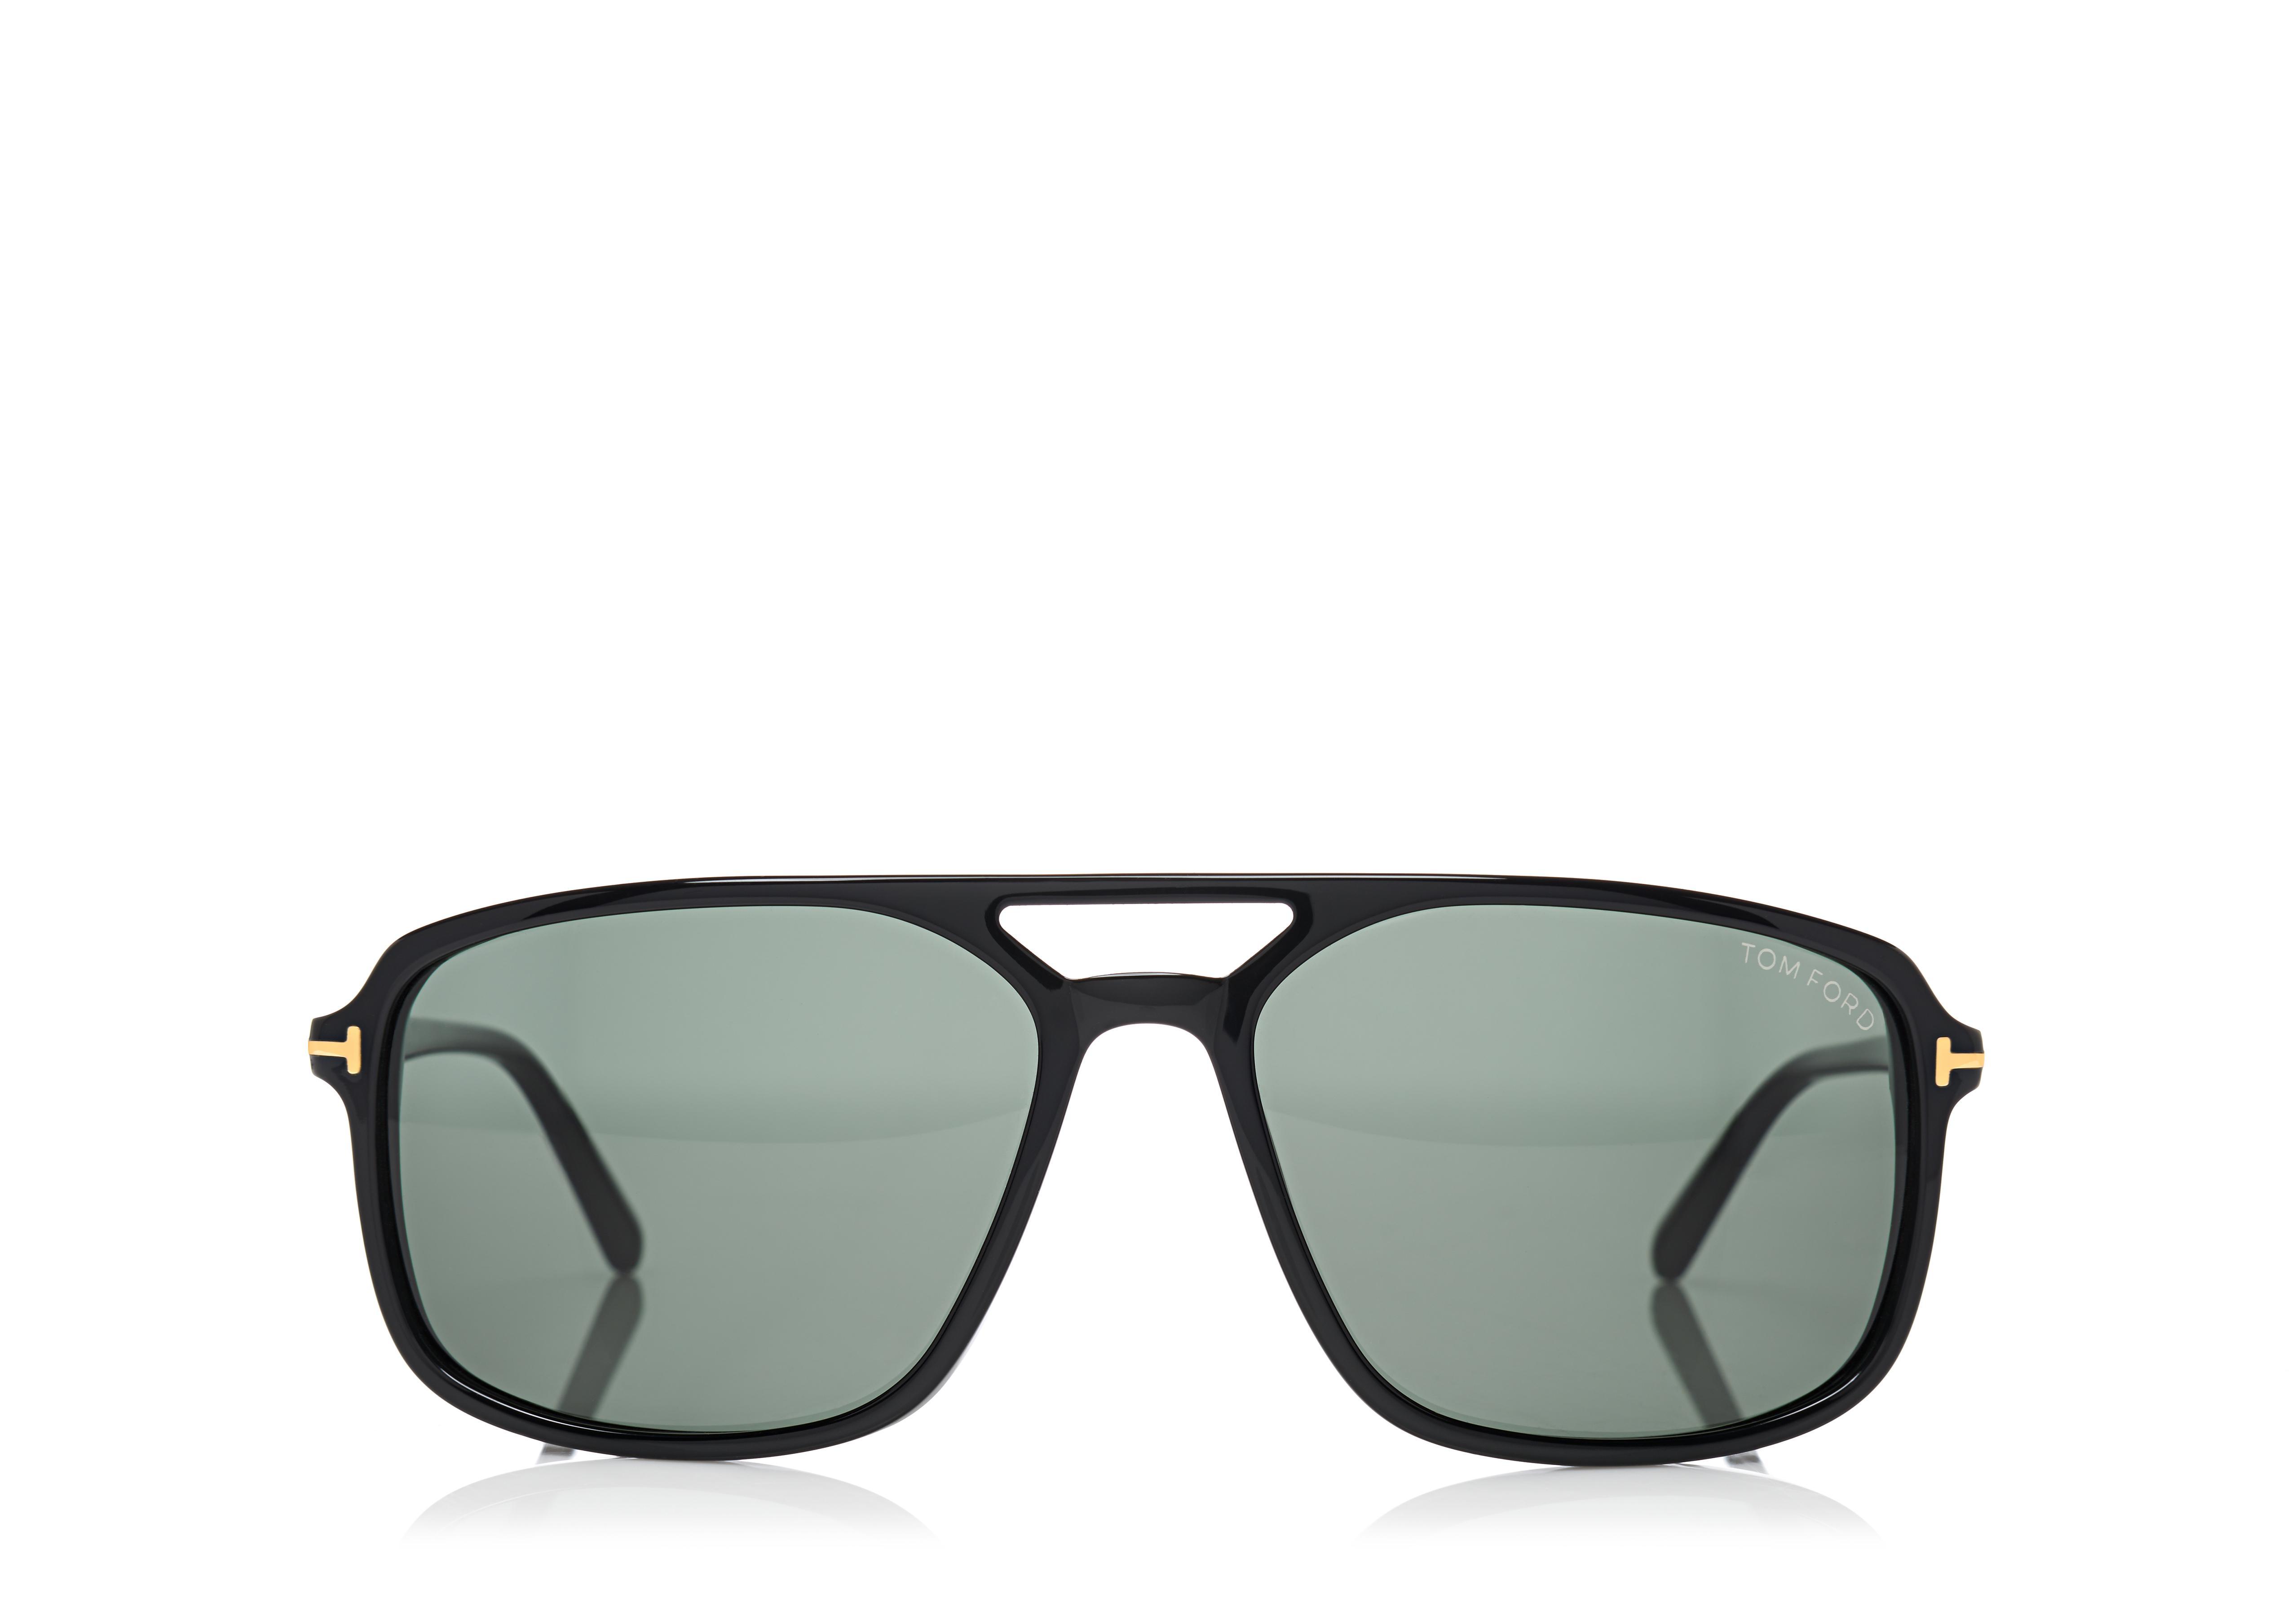 Terry Square Sunglasses A thumbnail